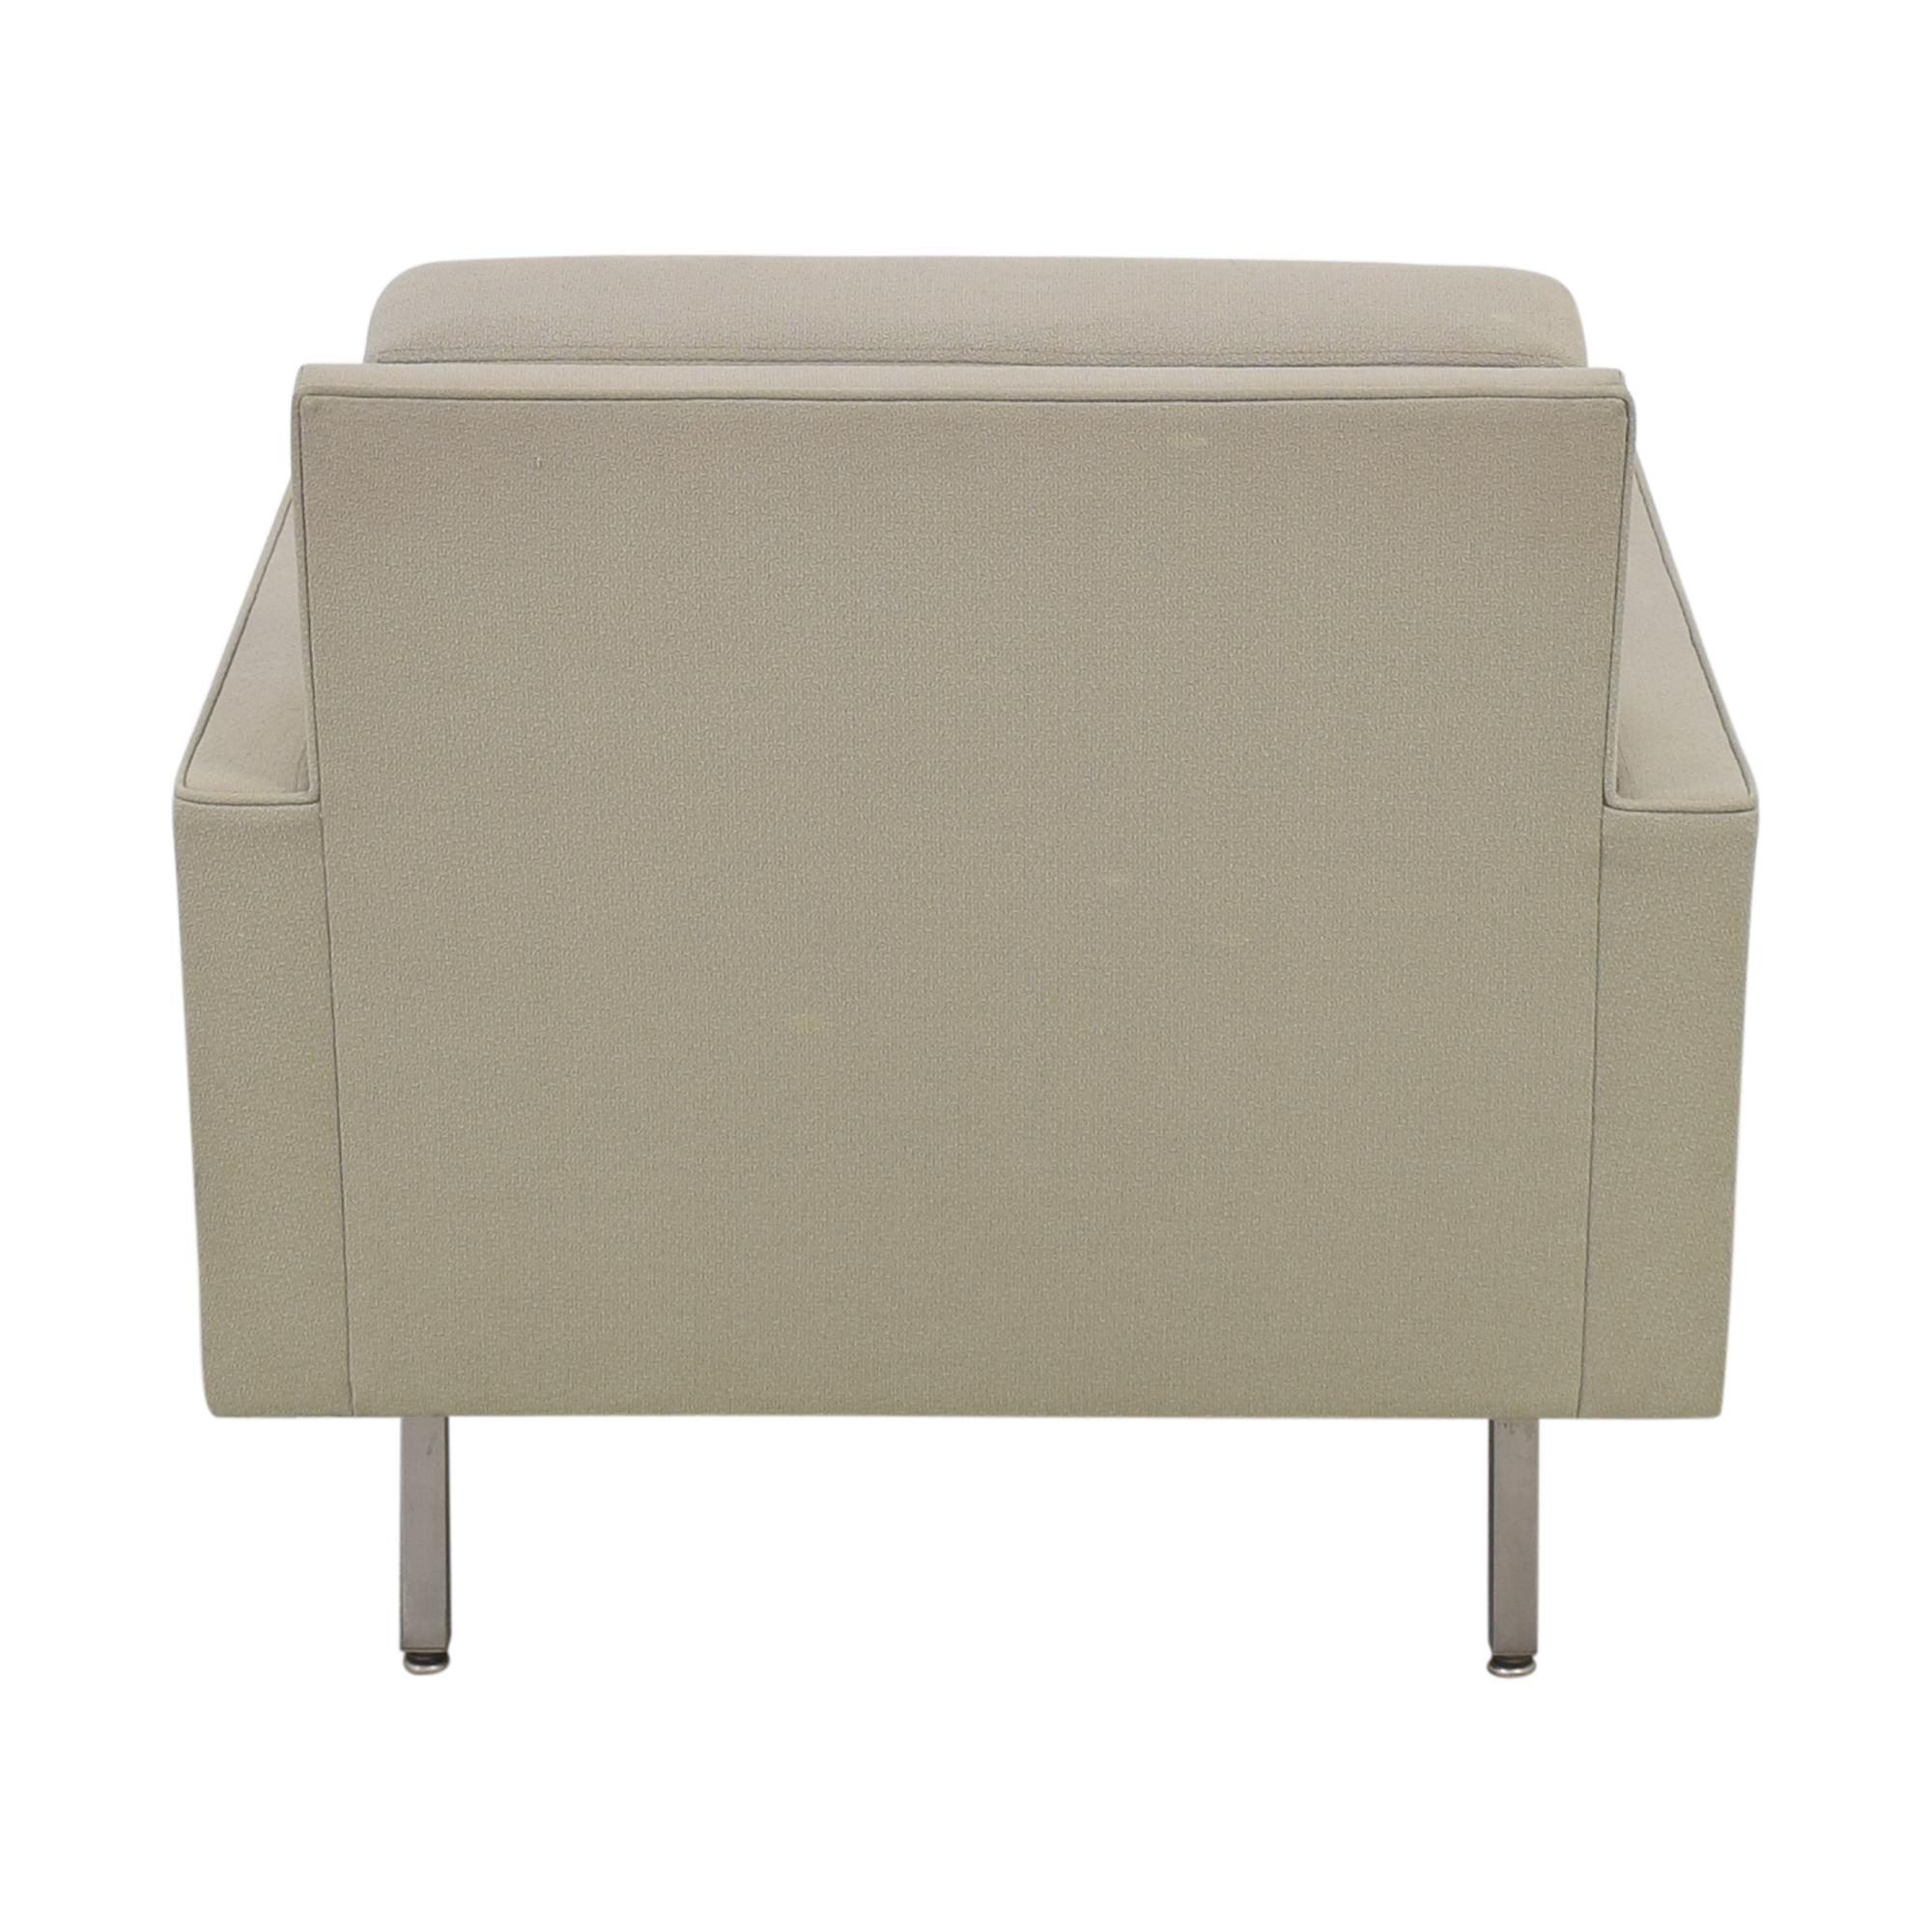 Modernica Modernica Case Study Furniture Chair